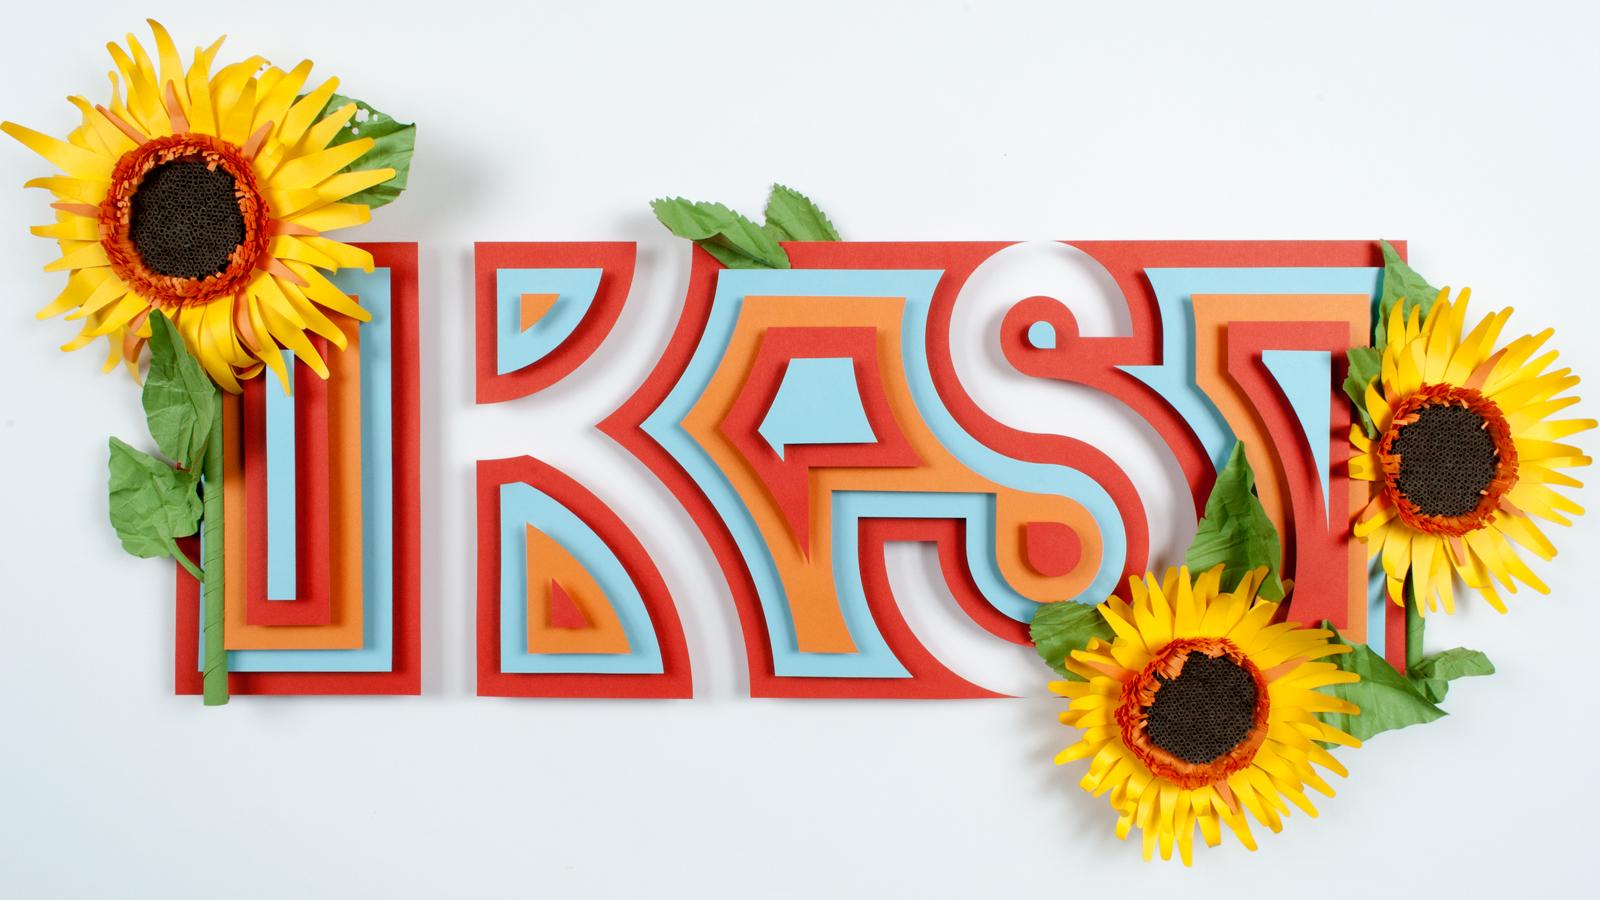 Paper State Flower composition: Kansas